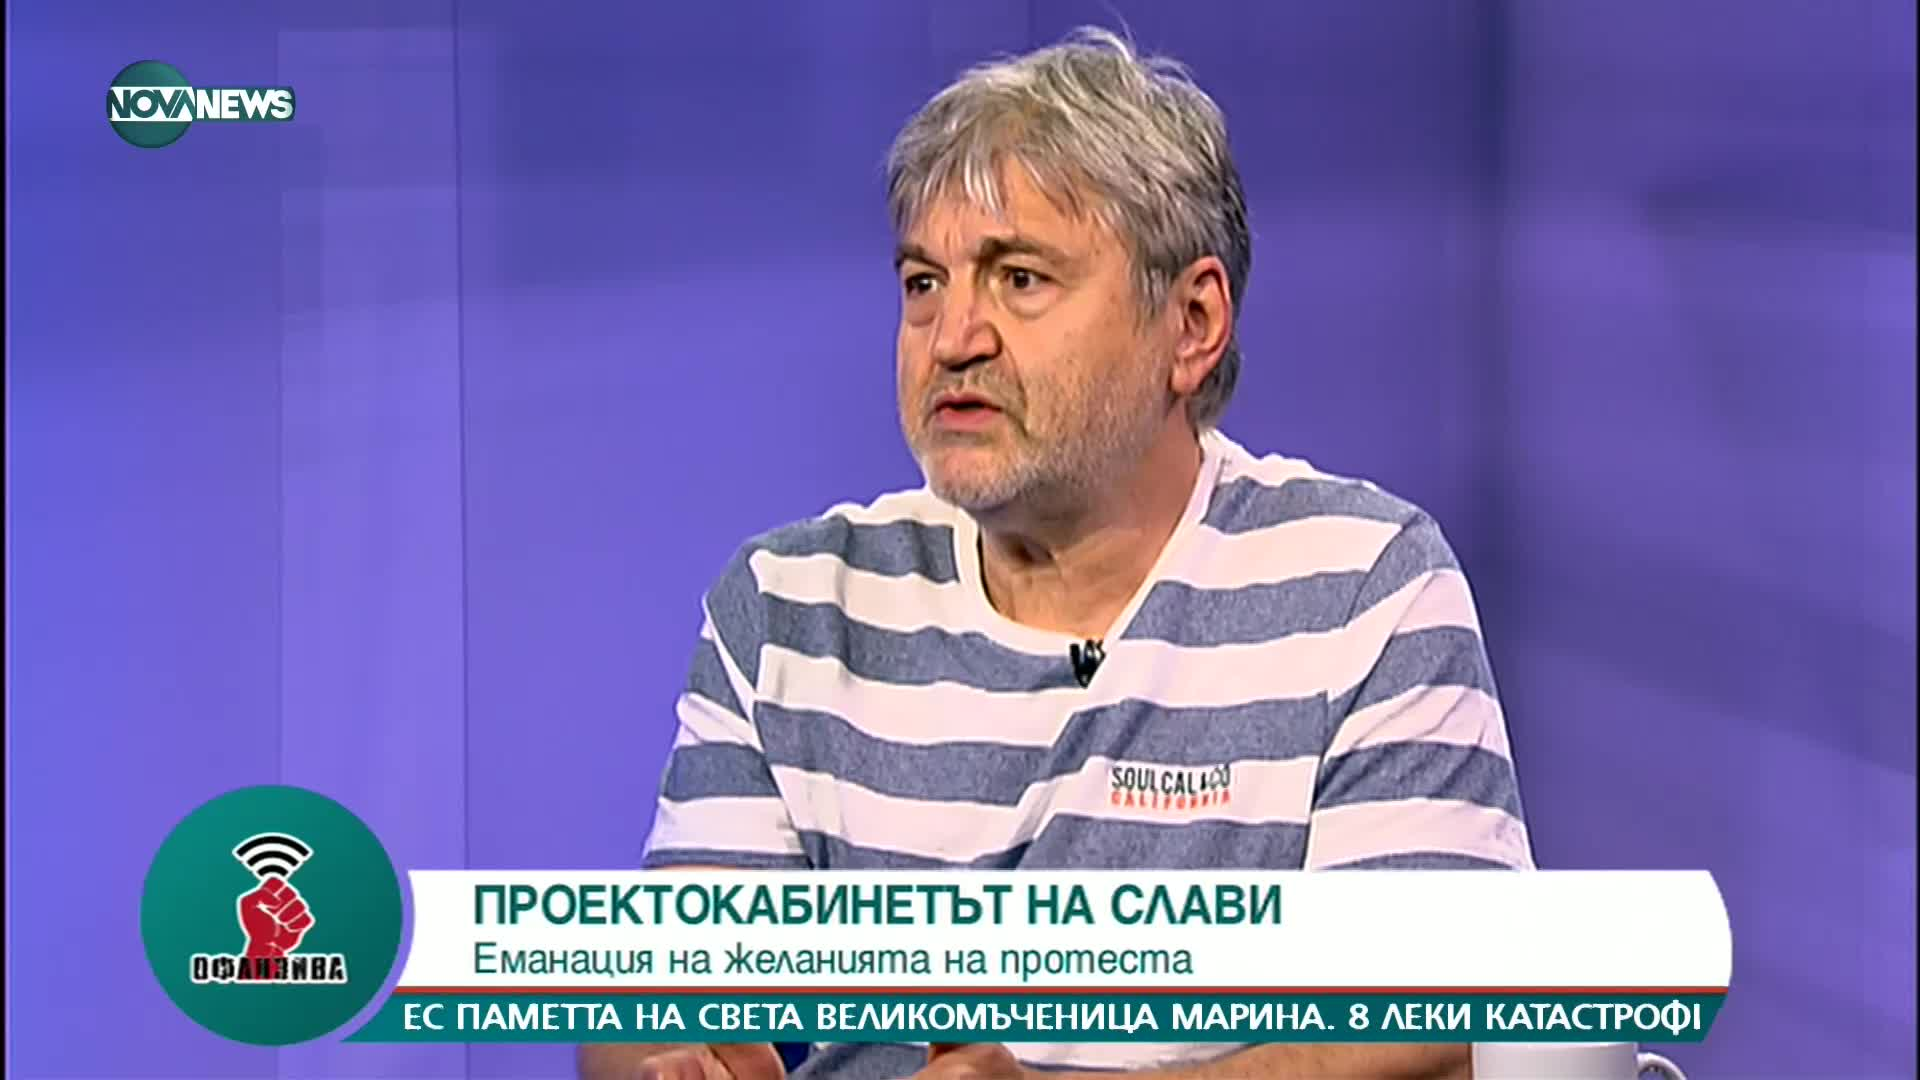 Петьо Блъсков: Слави Трифонов не може да произведе политика